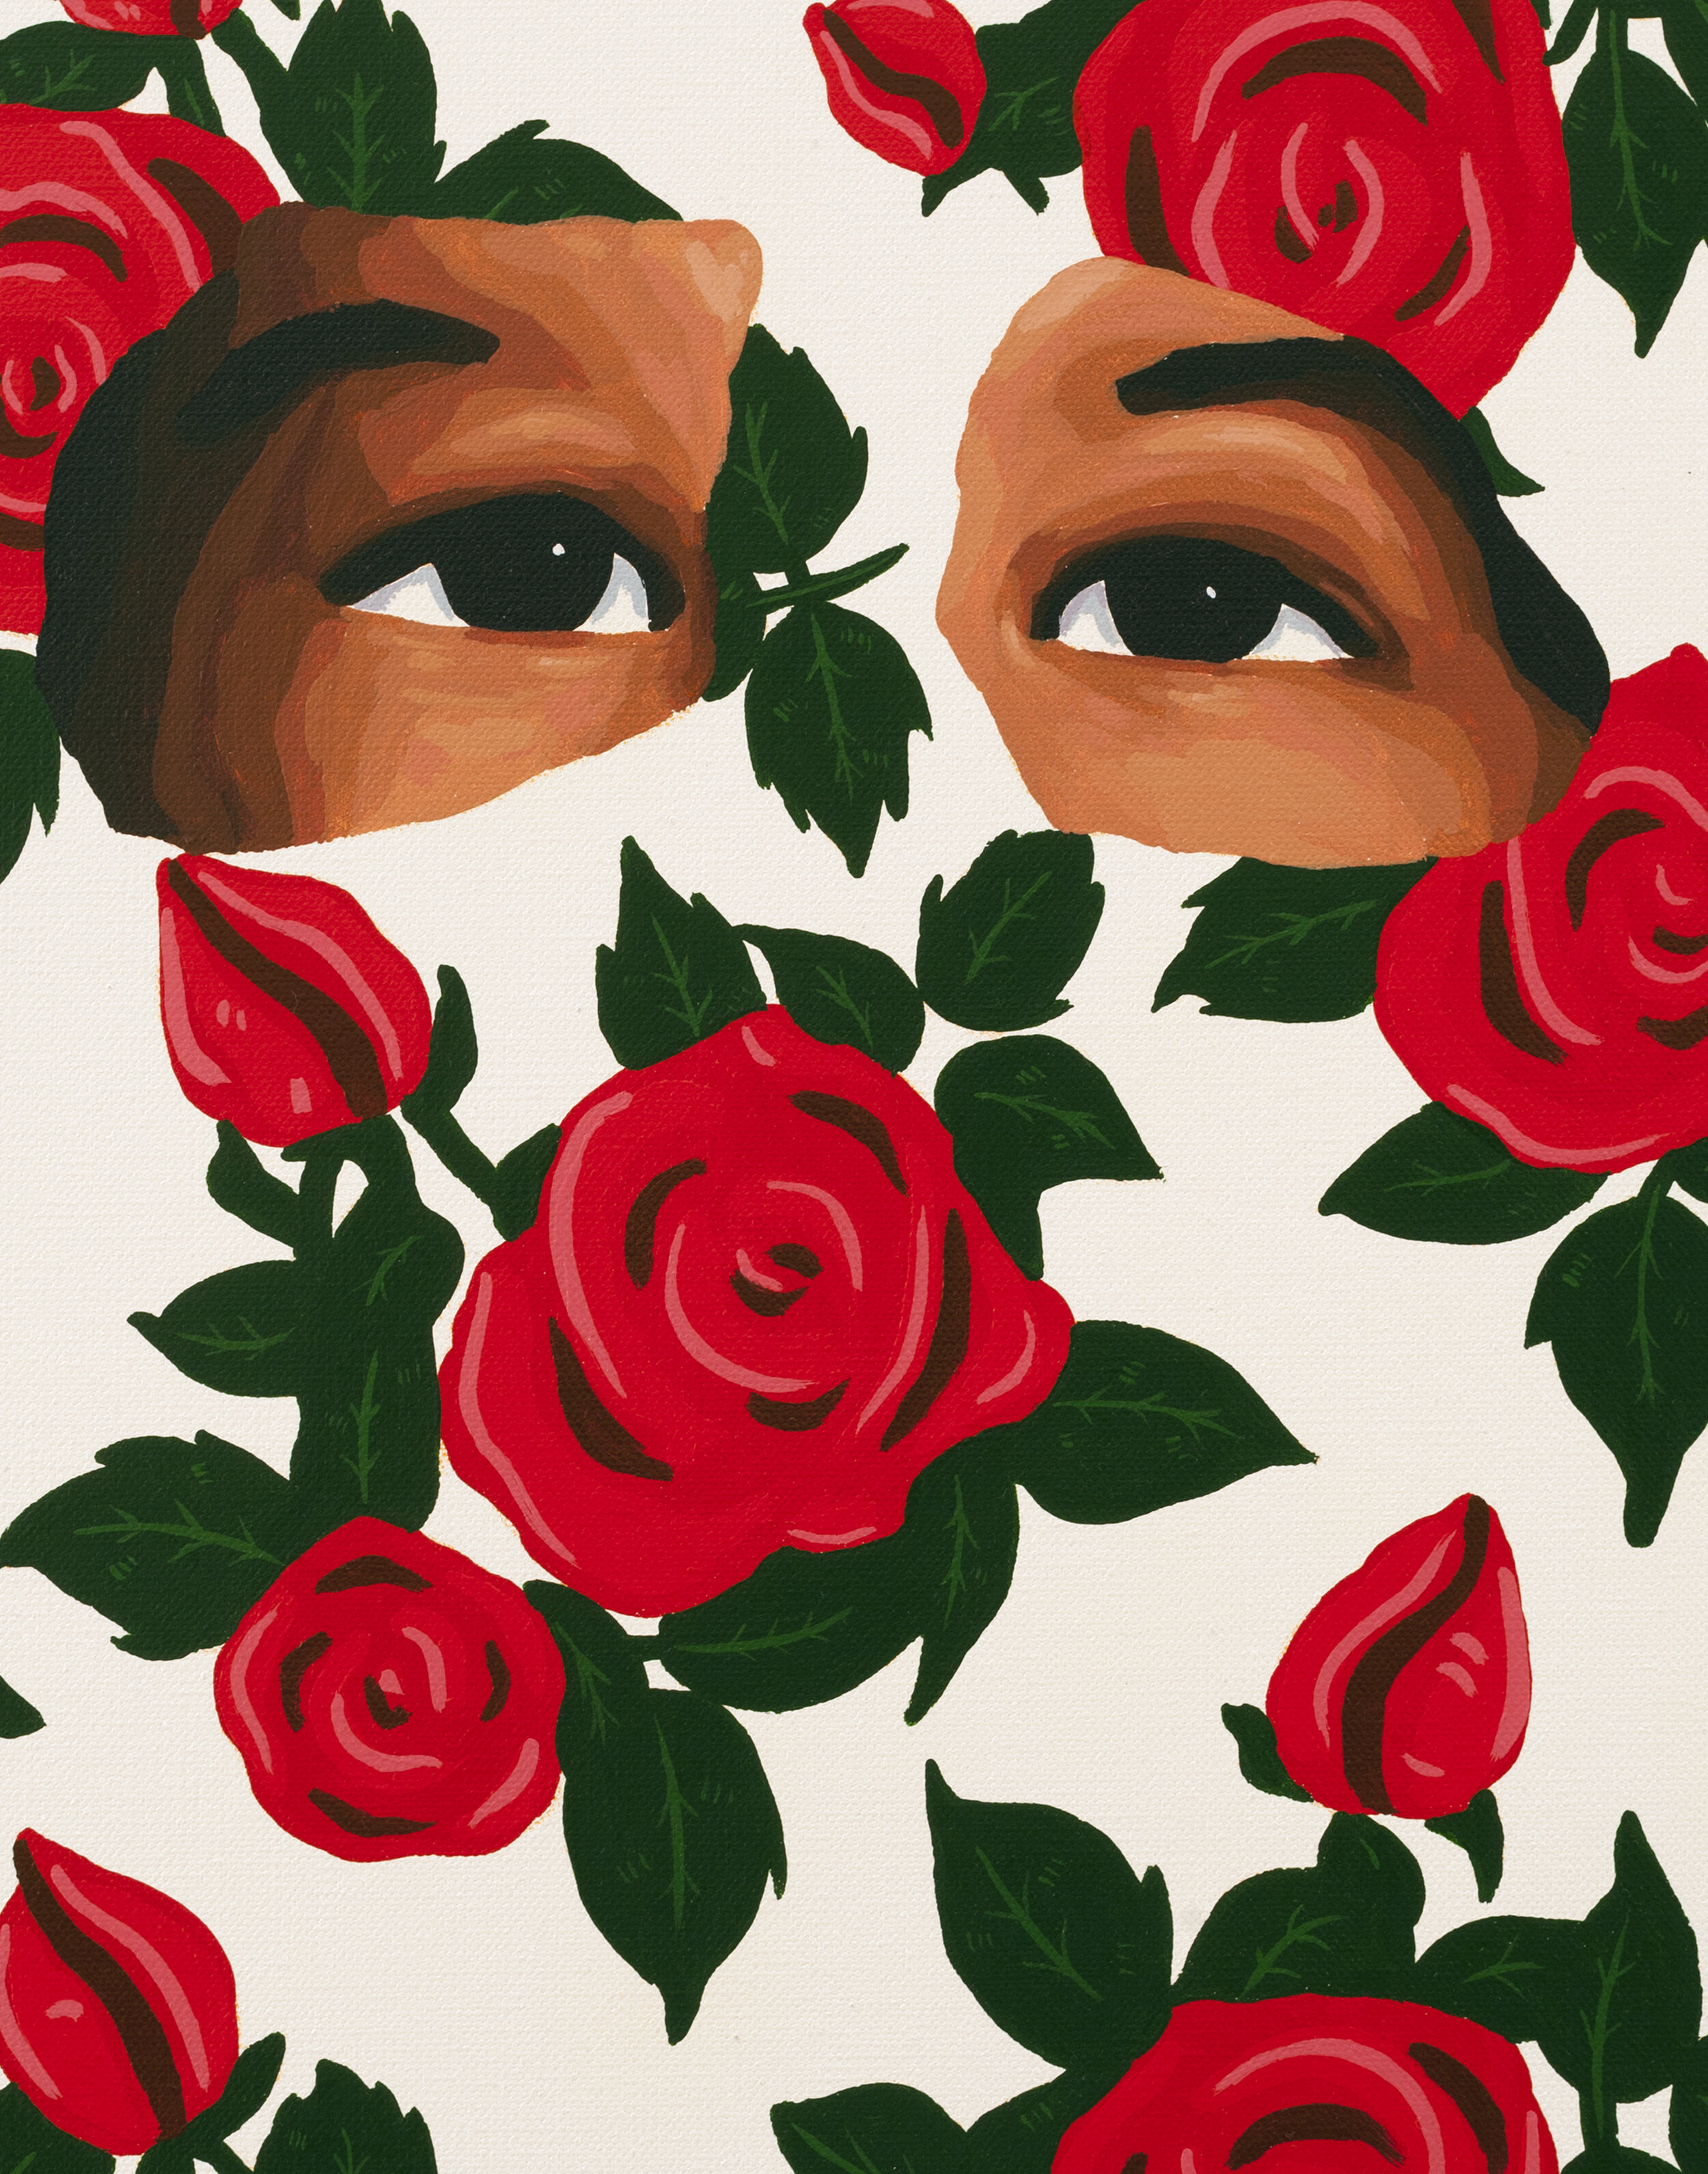 Wall of Roses.jpg